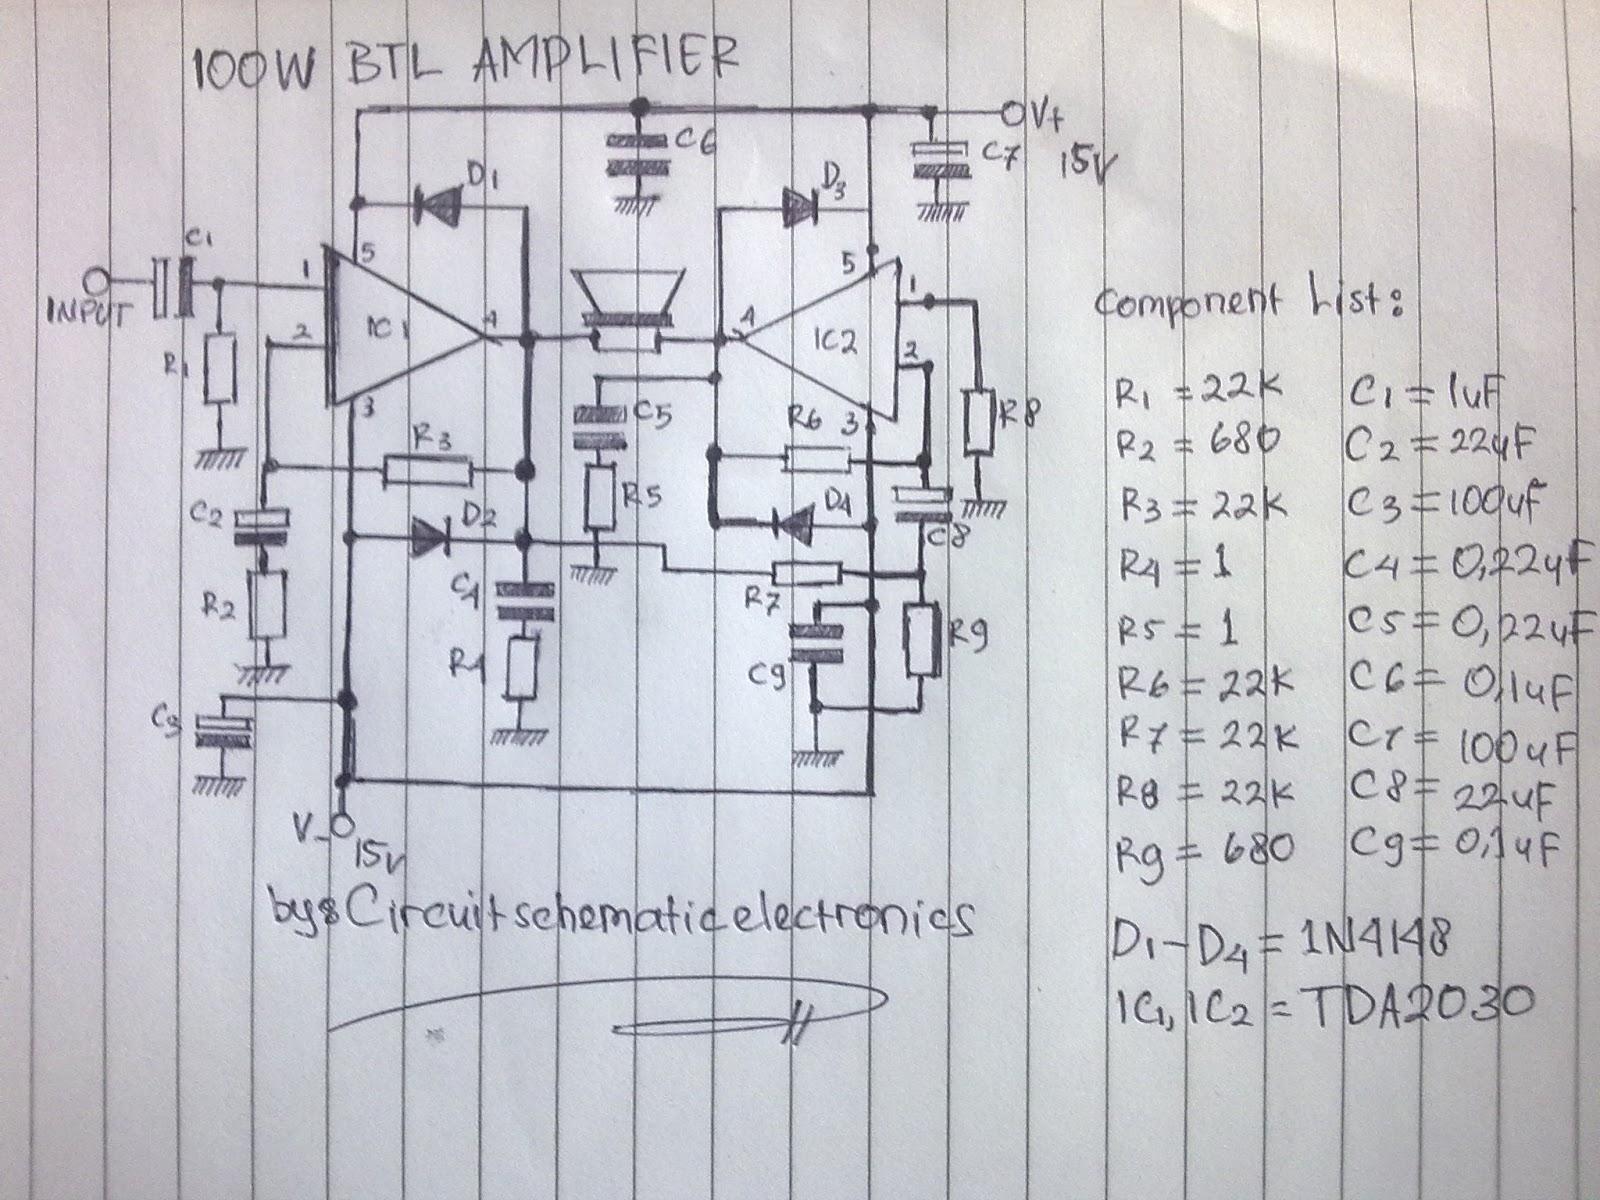 2000 jetta wiring diagram stereo wirdig wiring diagram 2010 ford edge limited 2008 pontiac g6 headlight wiring